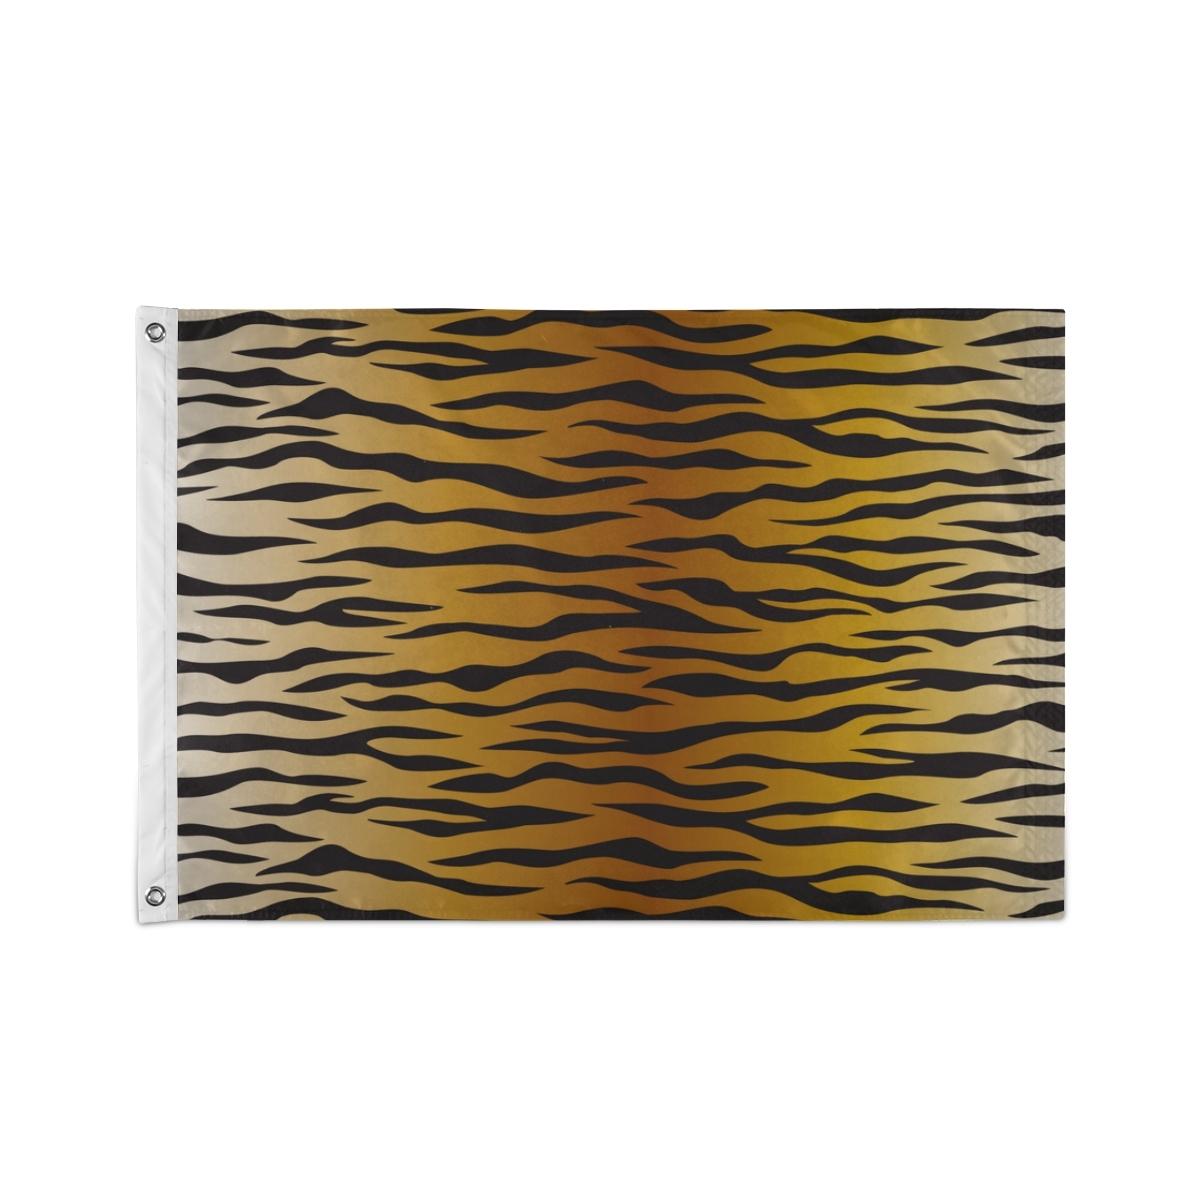 Custom Decor Flags Animal Skin Tiger Stripes Black Flags Wall Decor - $24.99